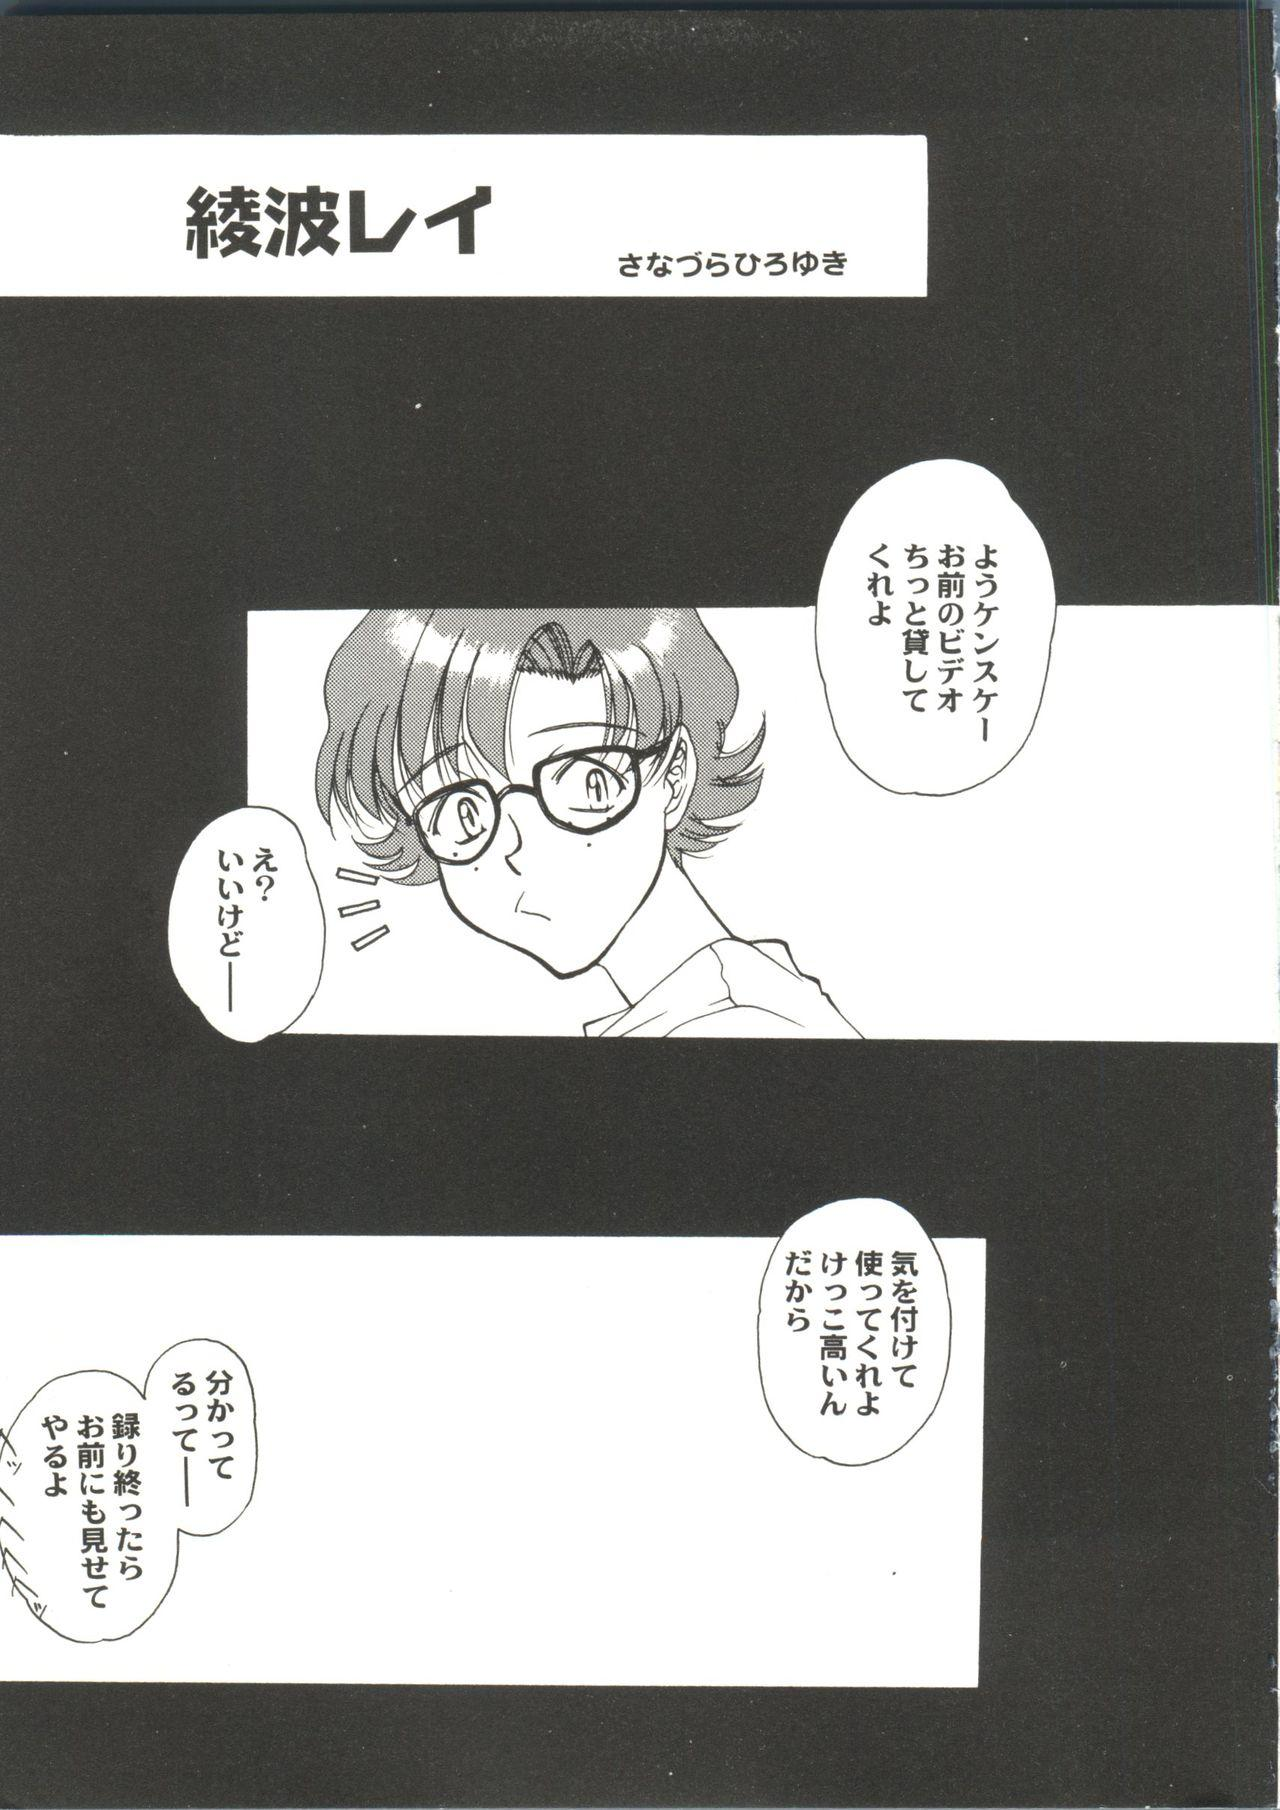 Bishoujo Doujin Peach Club - Pretty Gal's Fanzine Peach Club 9 4